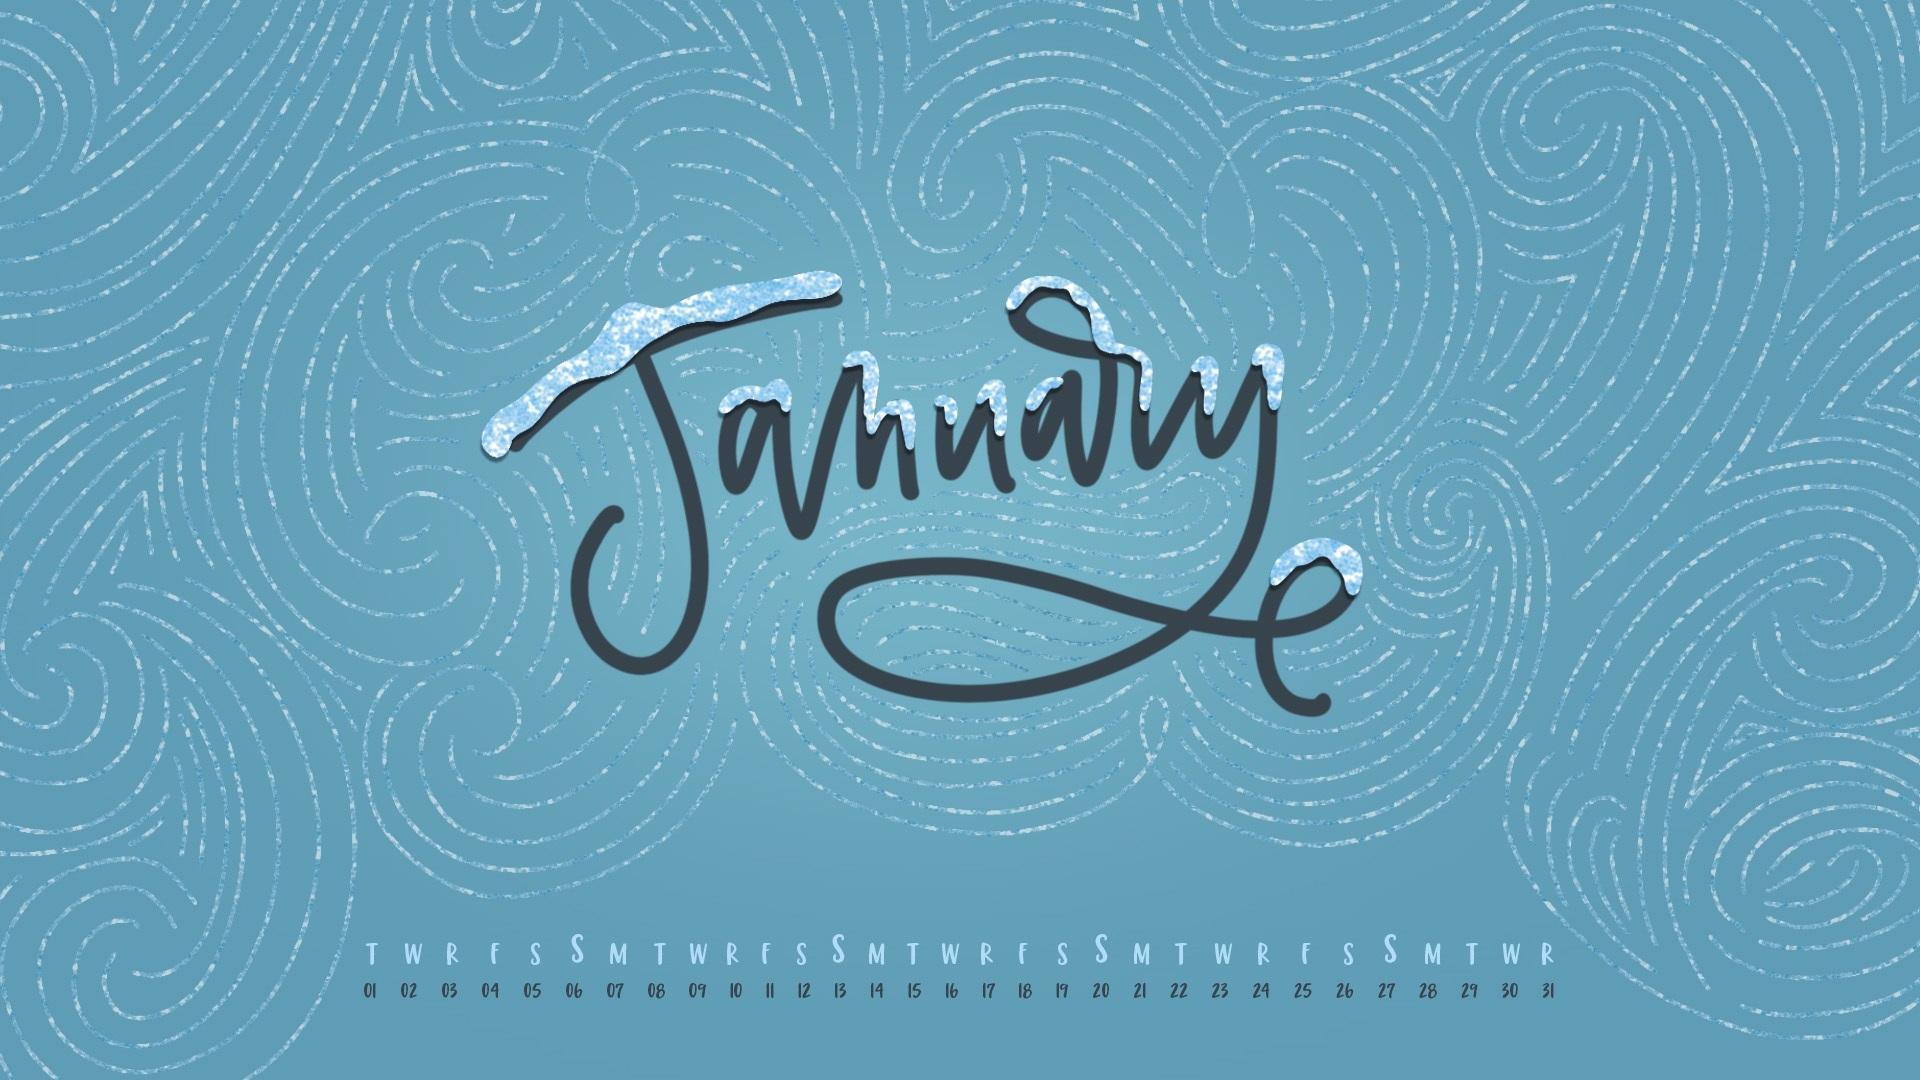 january 2019 hd calendar wallpapers calendar 2019 January 2019 HD Calendar Wallpapers erdferdf